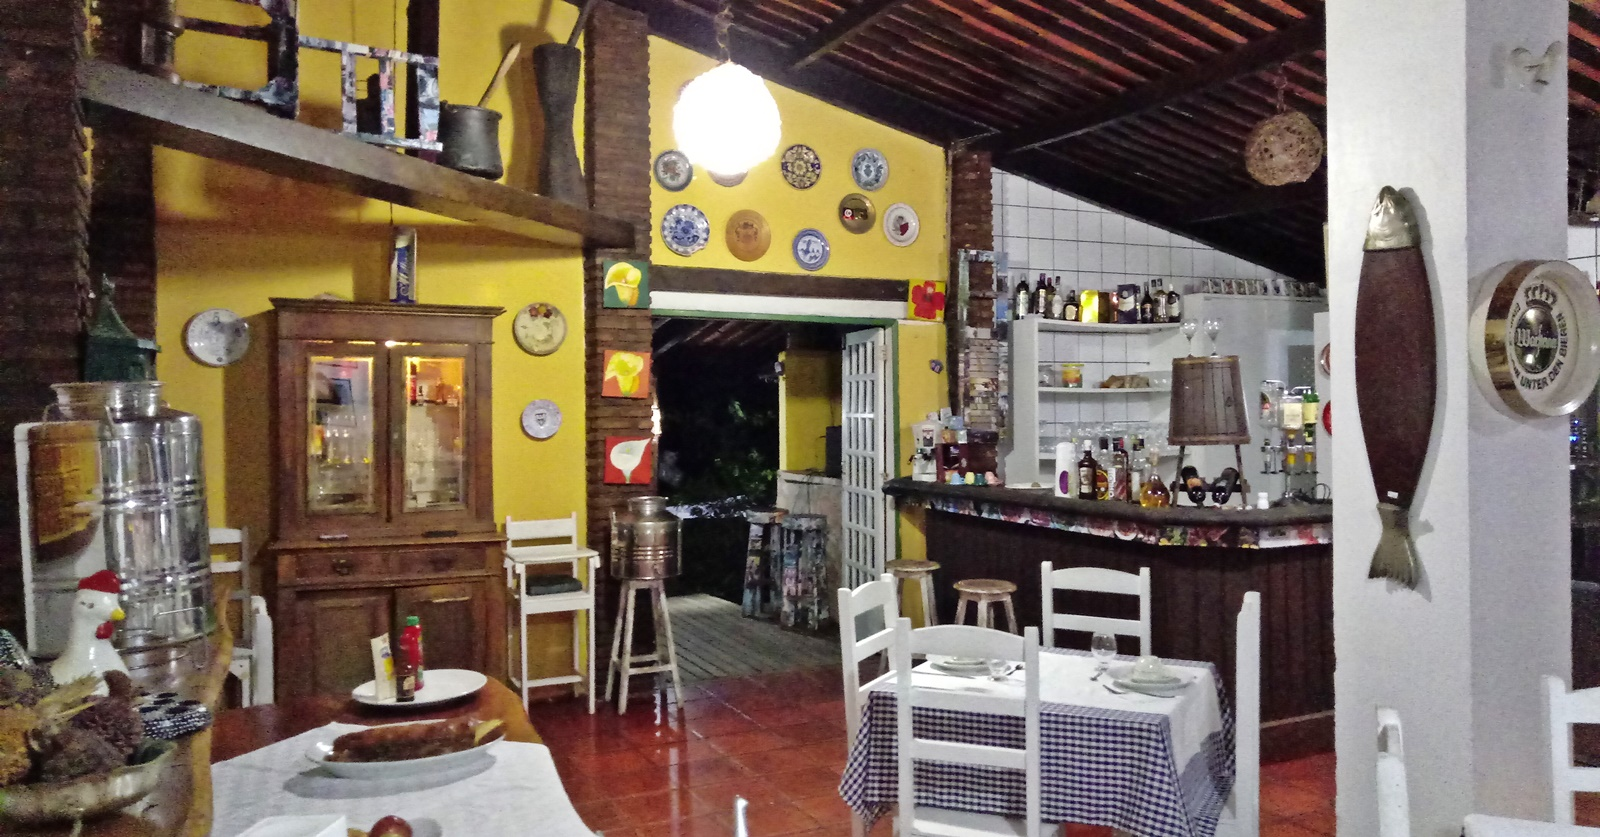 Restaurante-agura-da-prata